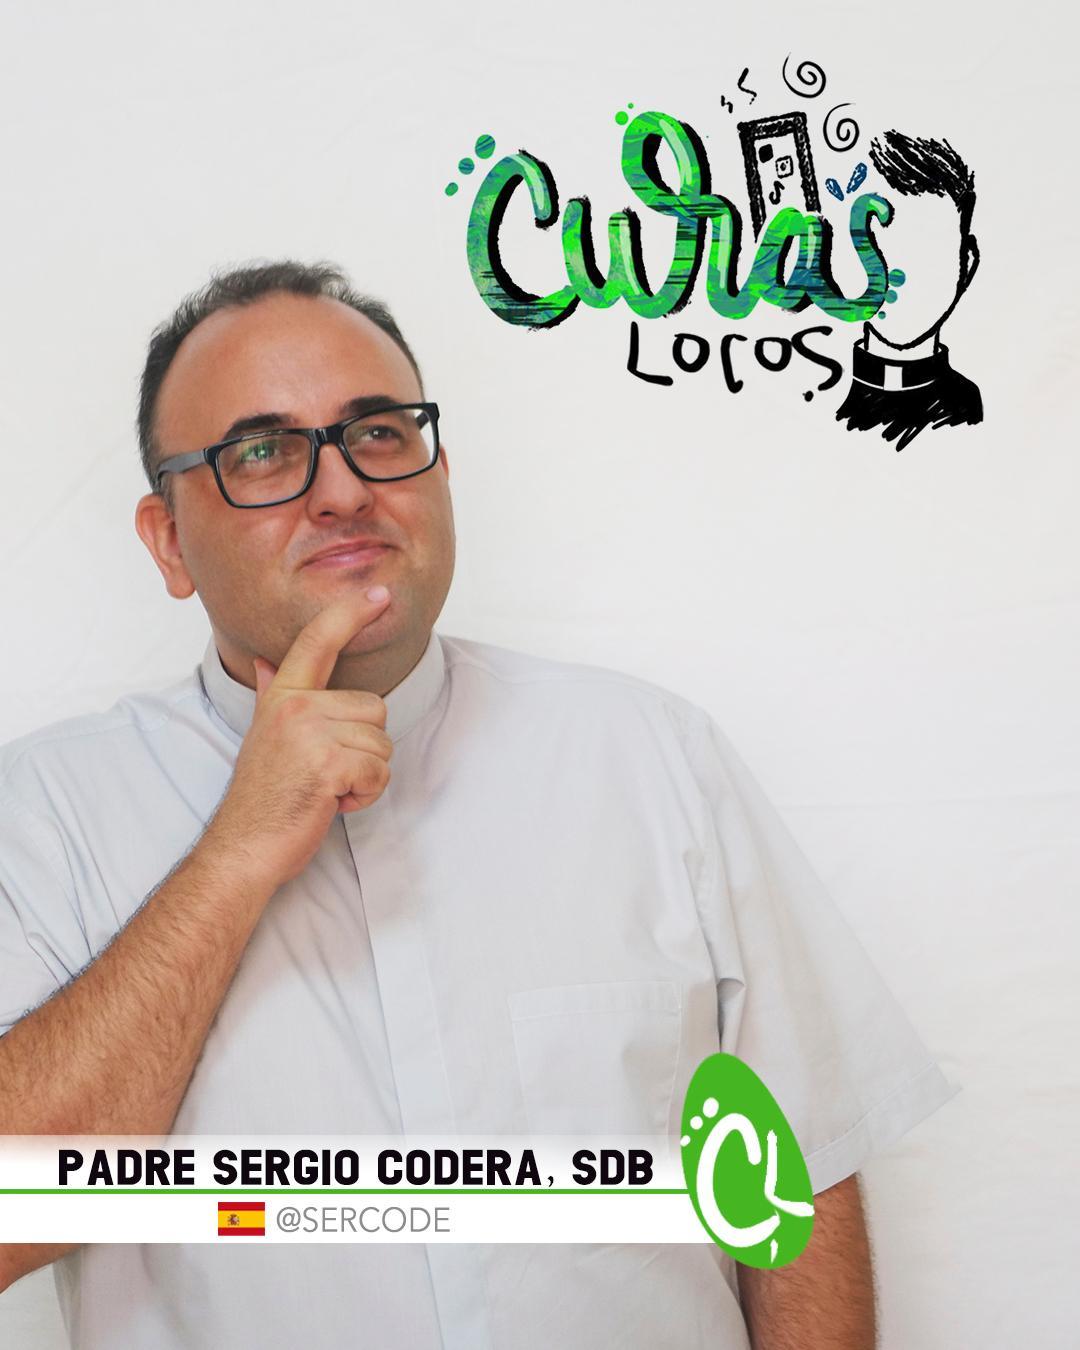 PADRE SERGIO CODERA